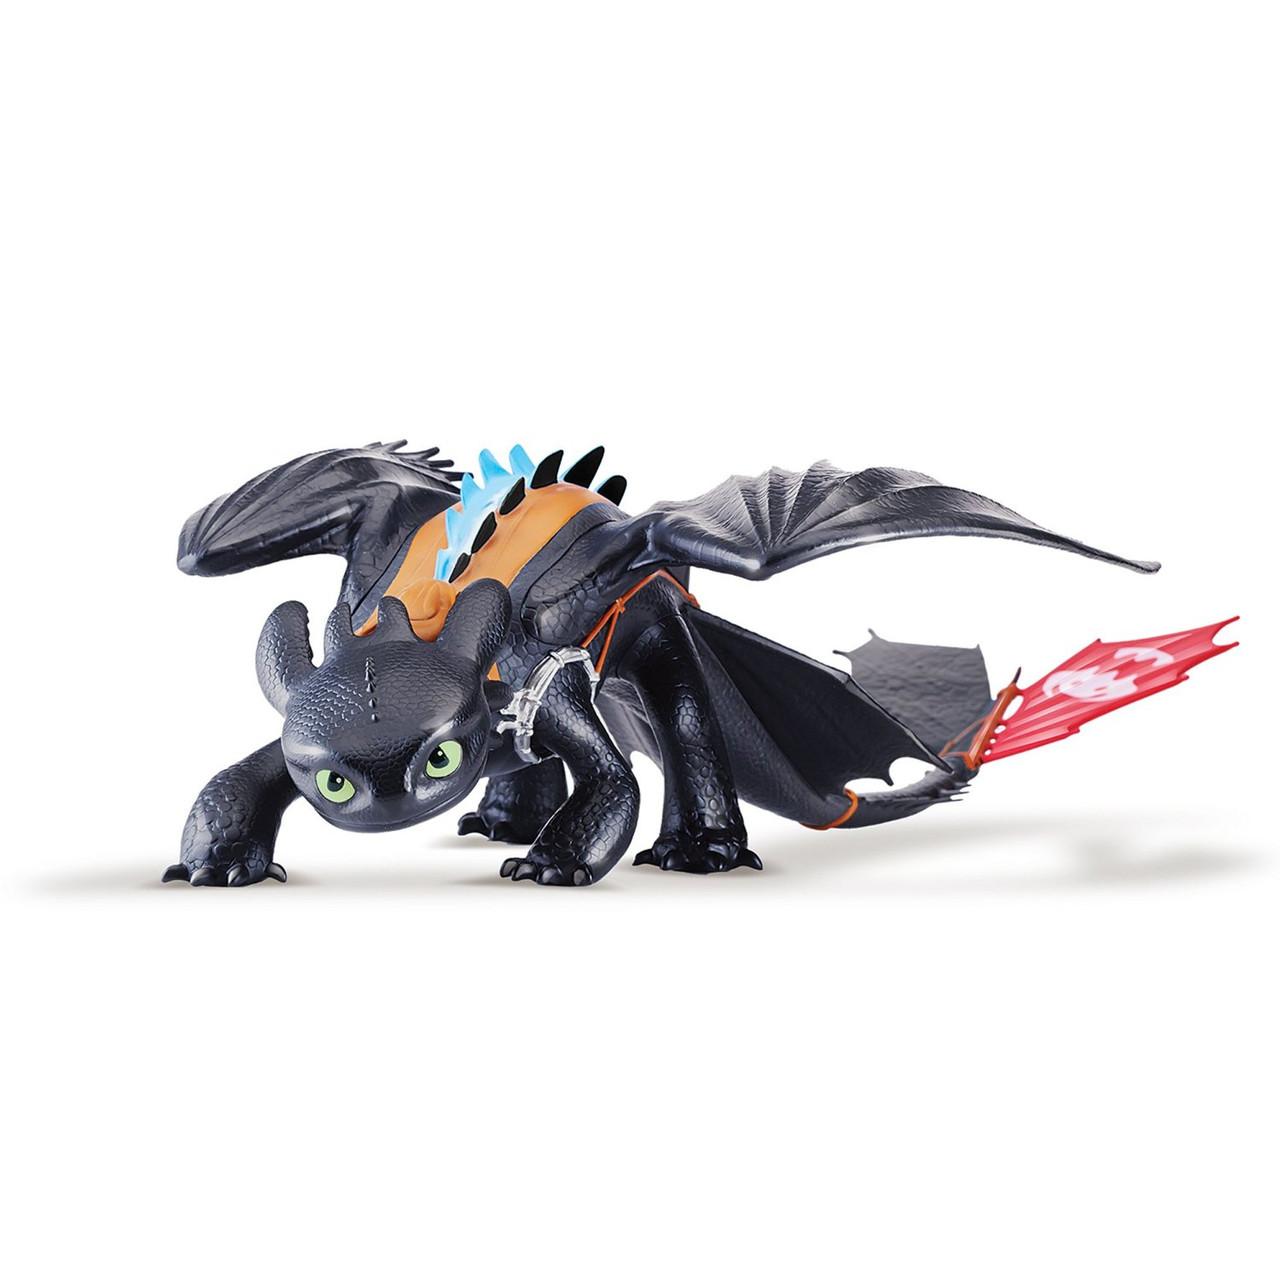 Большая игрушка дракон Беззубик 58 см.